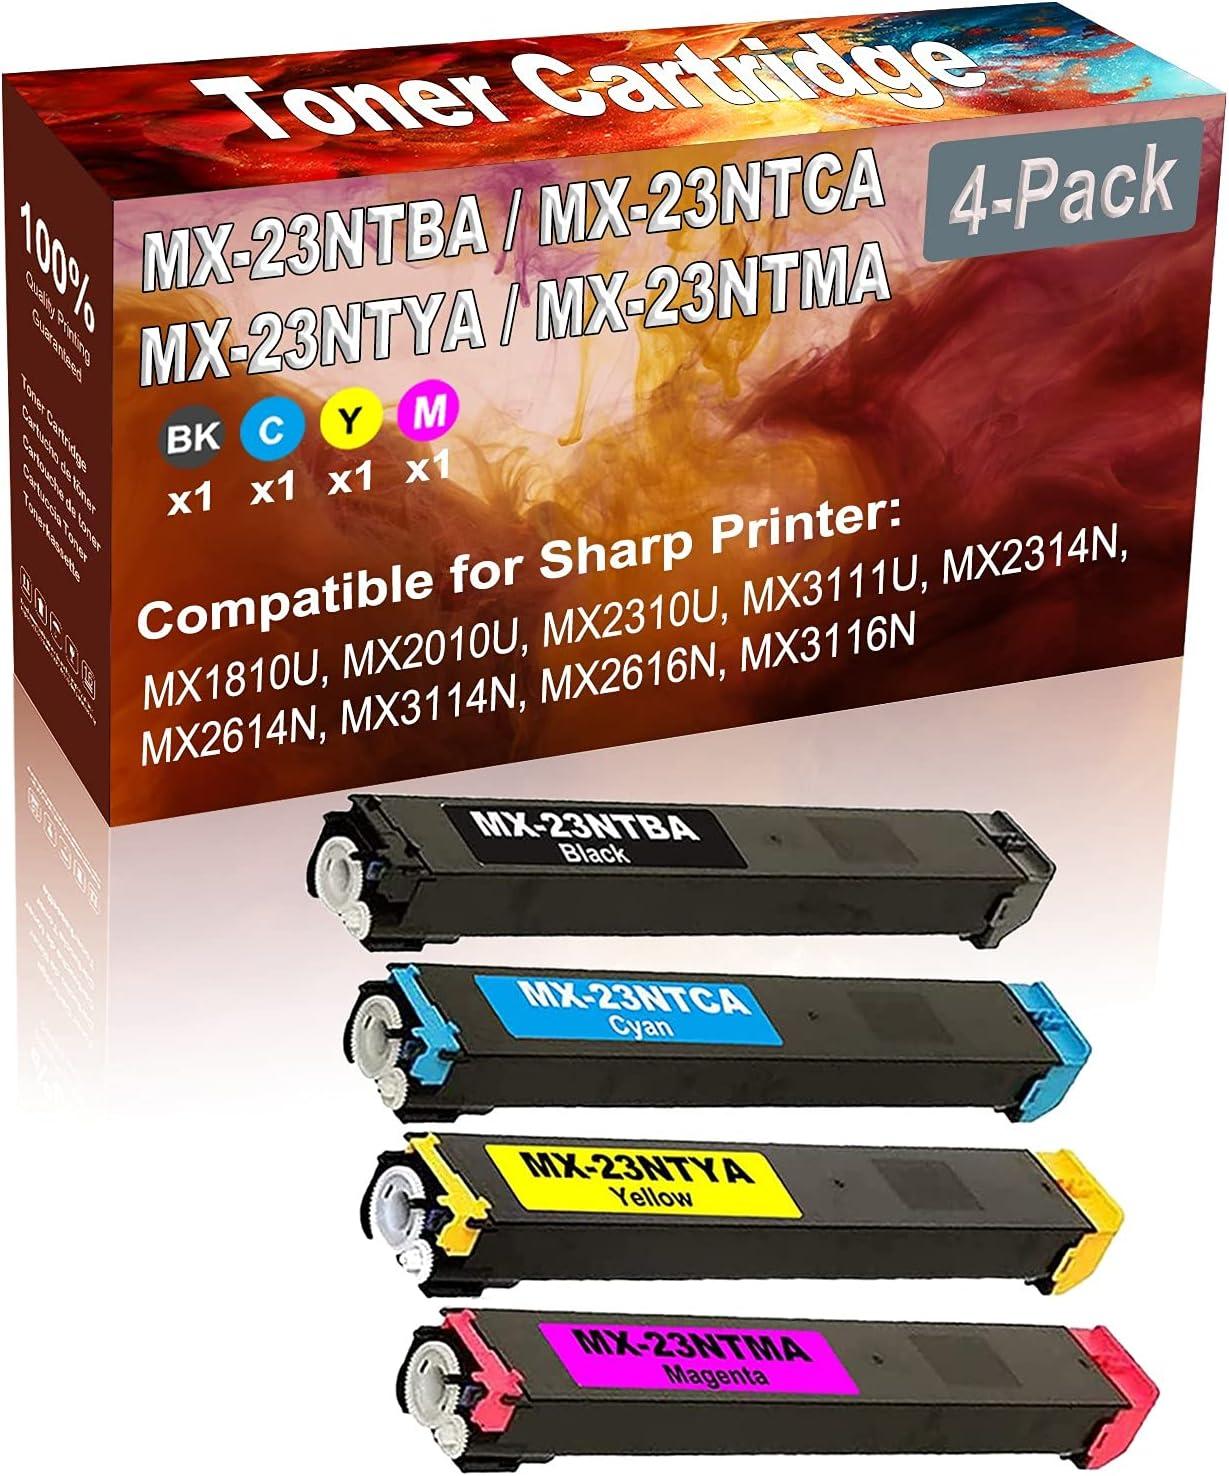 4-Pack (BK+C+Y+M) Compatible MX1810U MX2010U MX2310U Laser Printer Toner Cartridge (High Capacity) Replacement for Sharp MX-23NTBA MX-23NTCA MX-23NTYA MX-23NTMA Printer Toner Cartridge